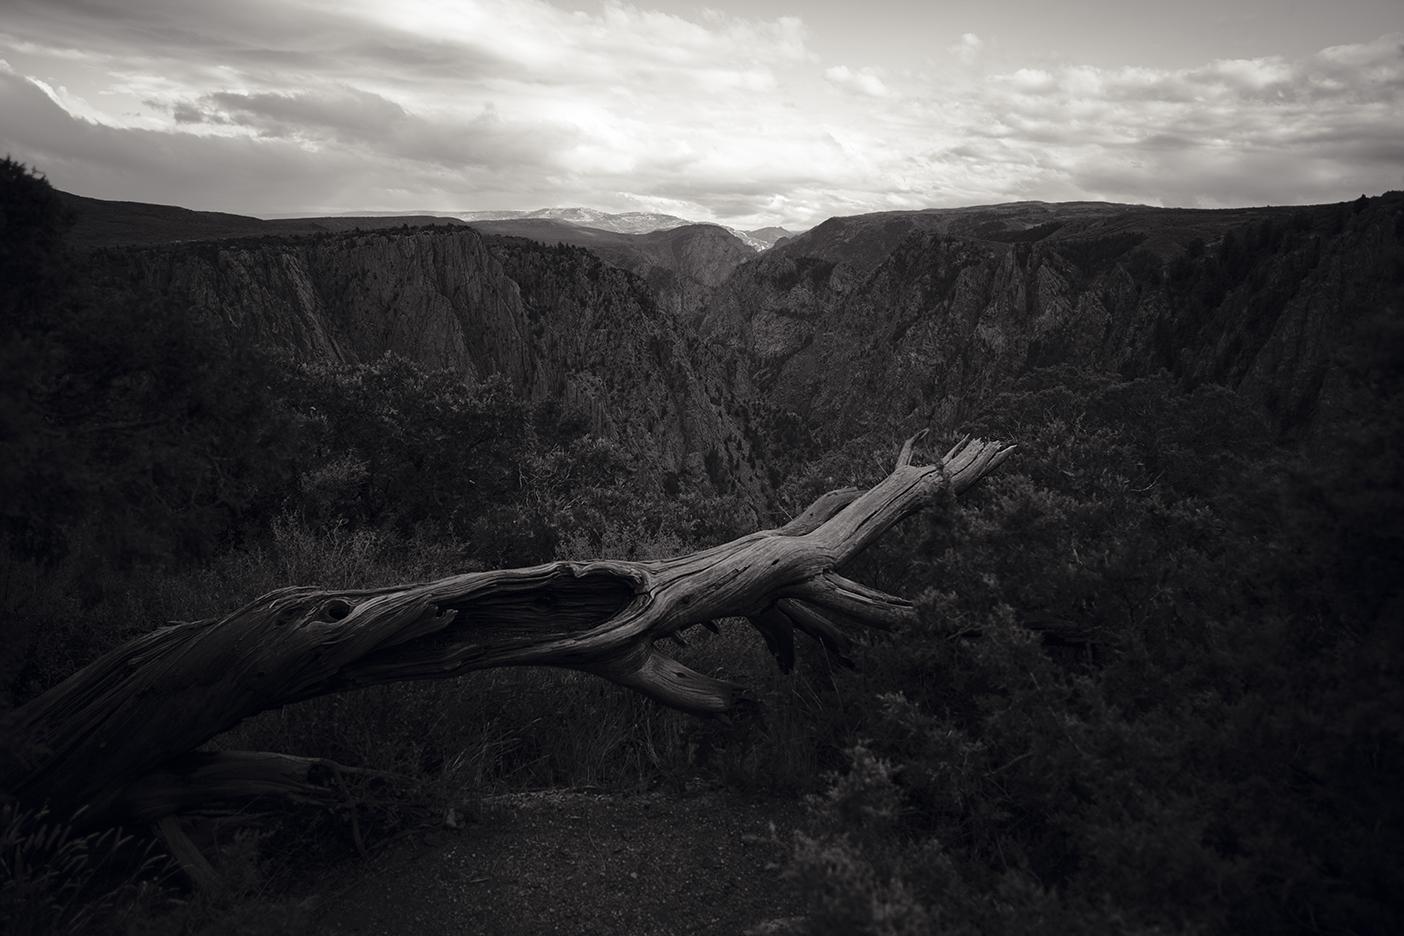 Overlooking The Black Canyon -  © Jonathan Urrutia